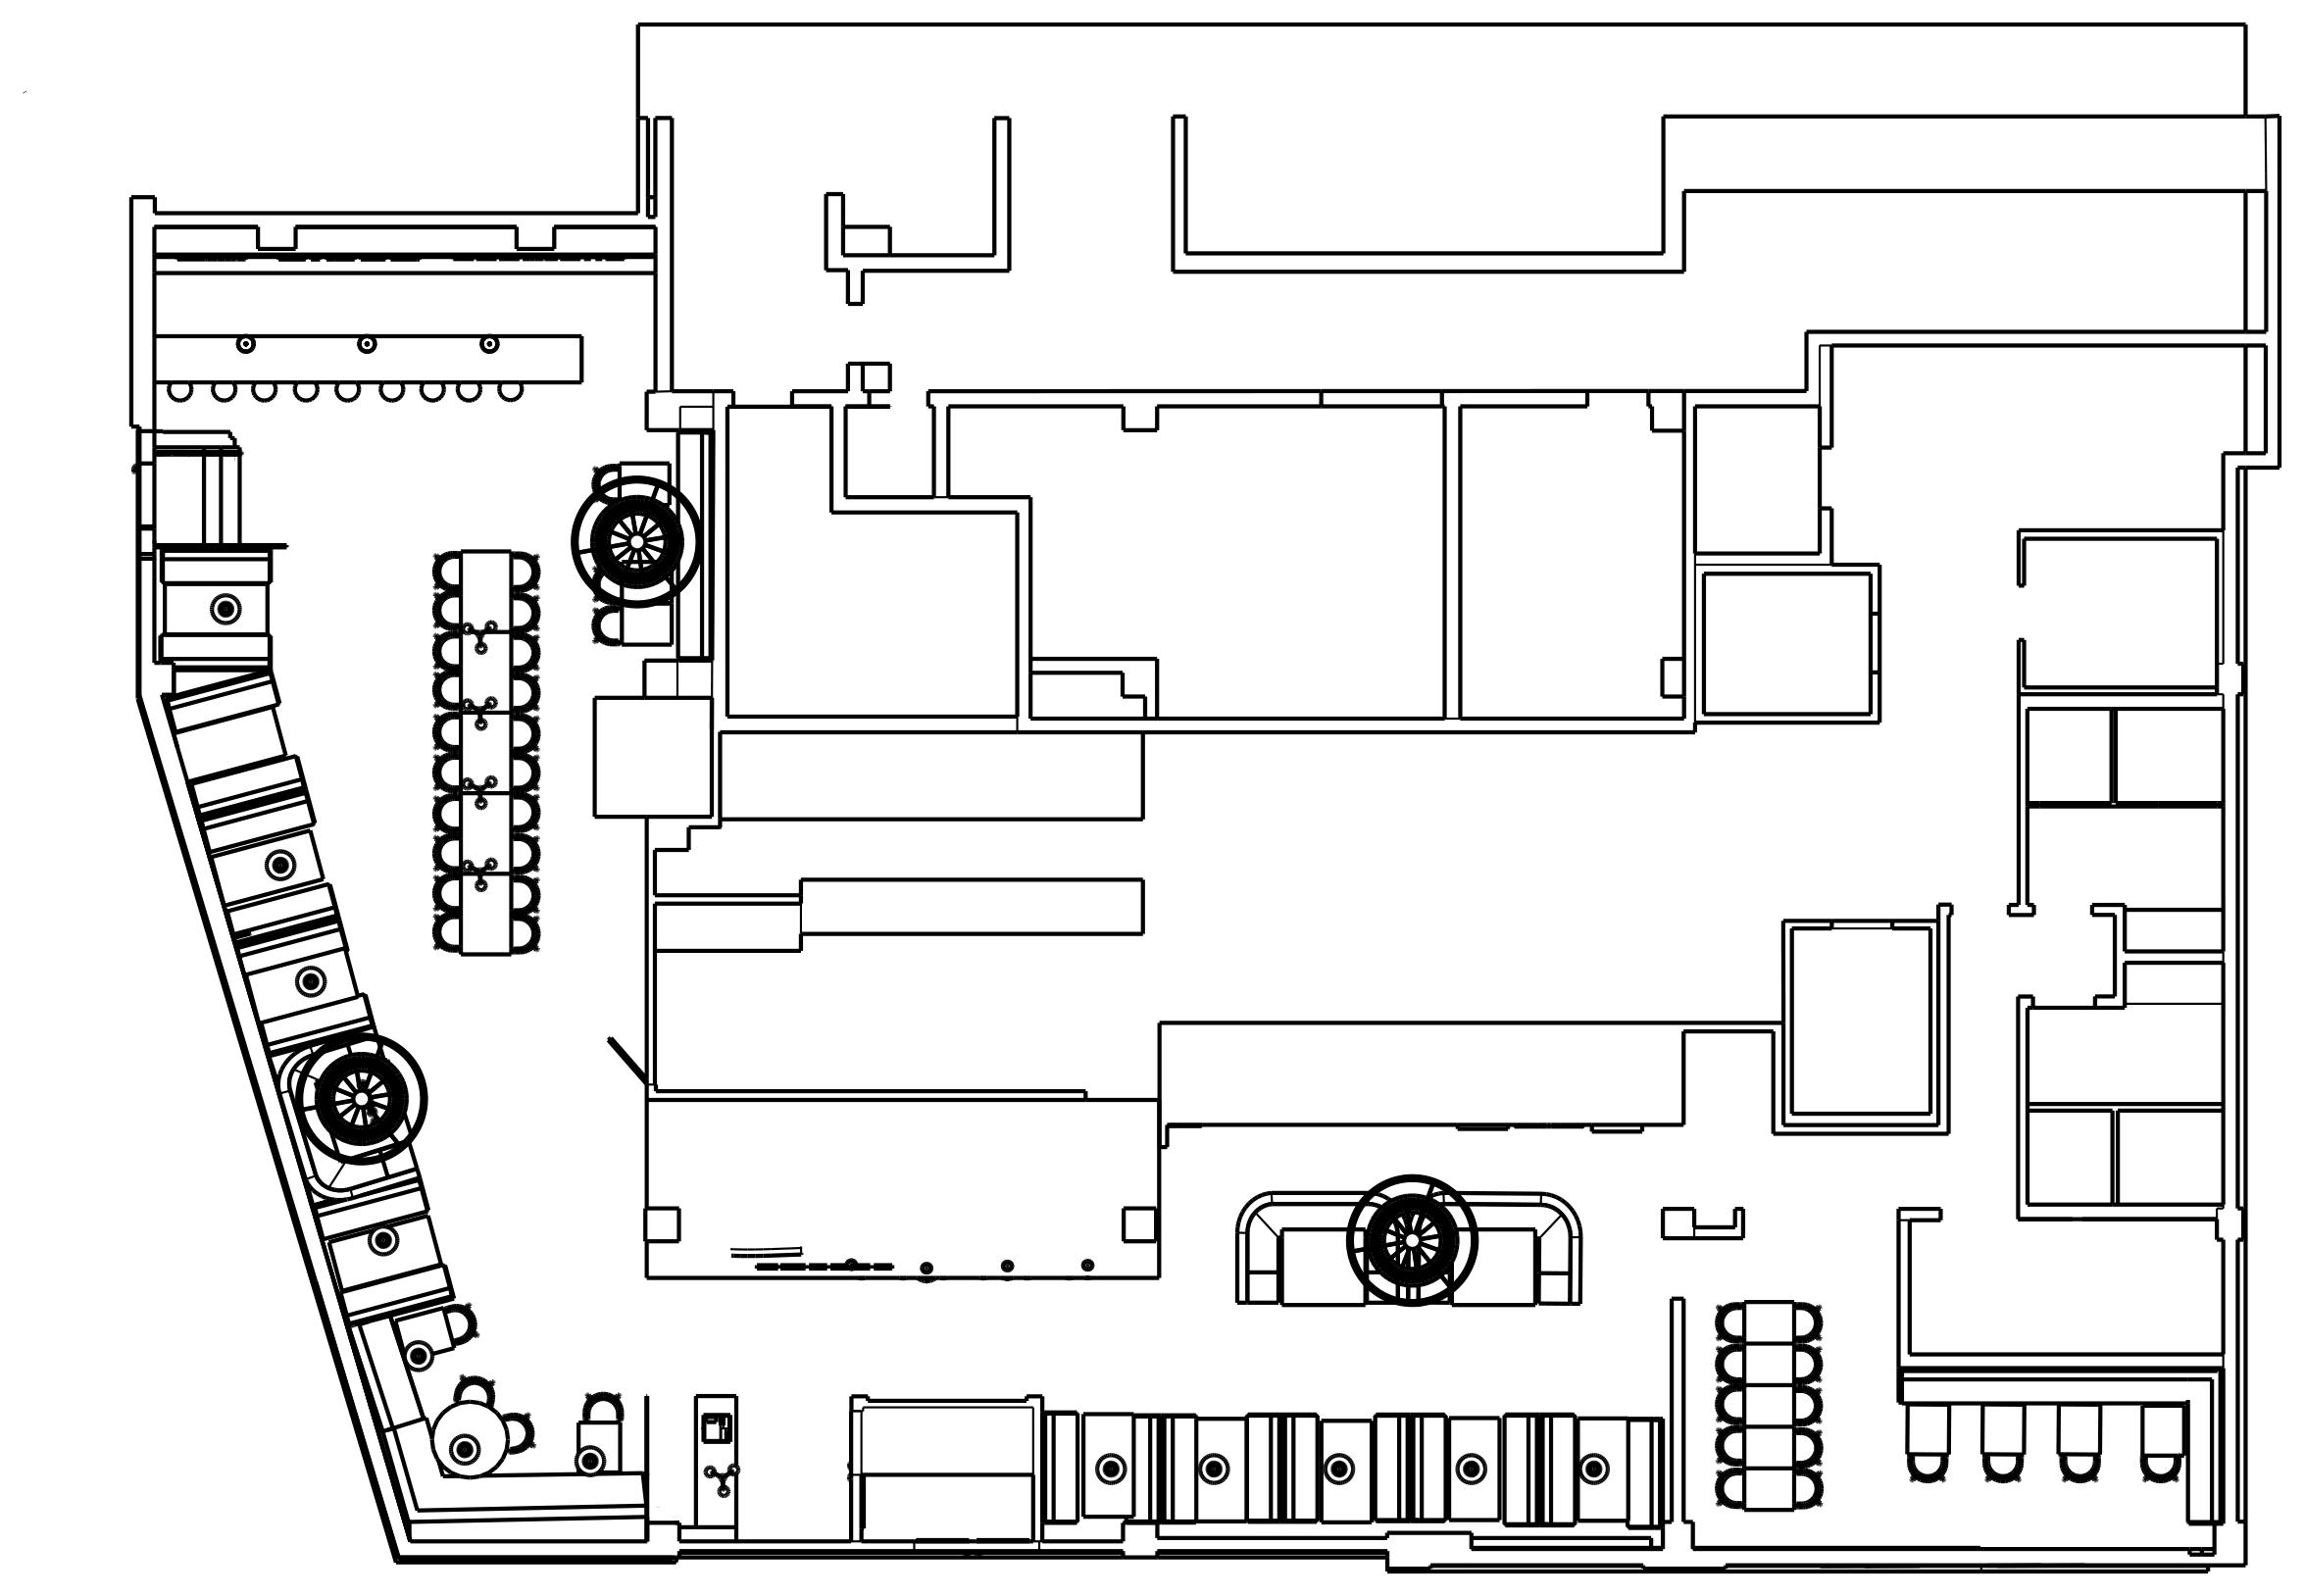 City Diner 071516 Floorplan.png